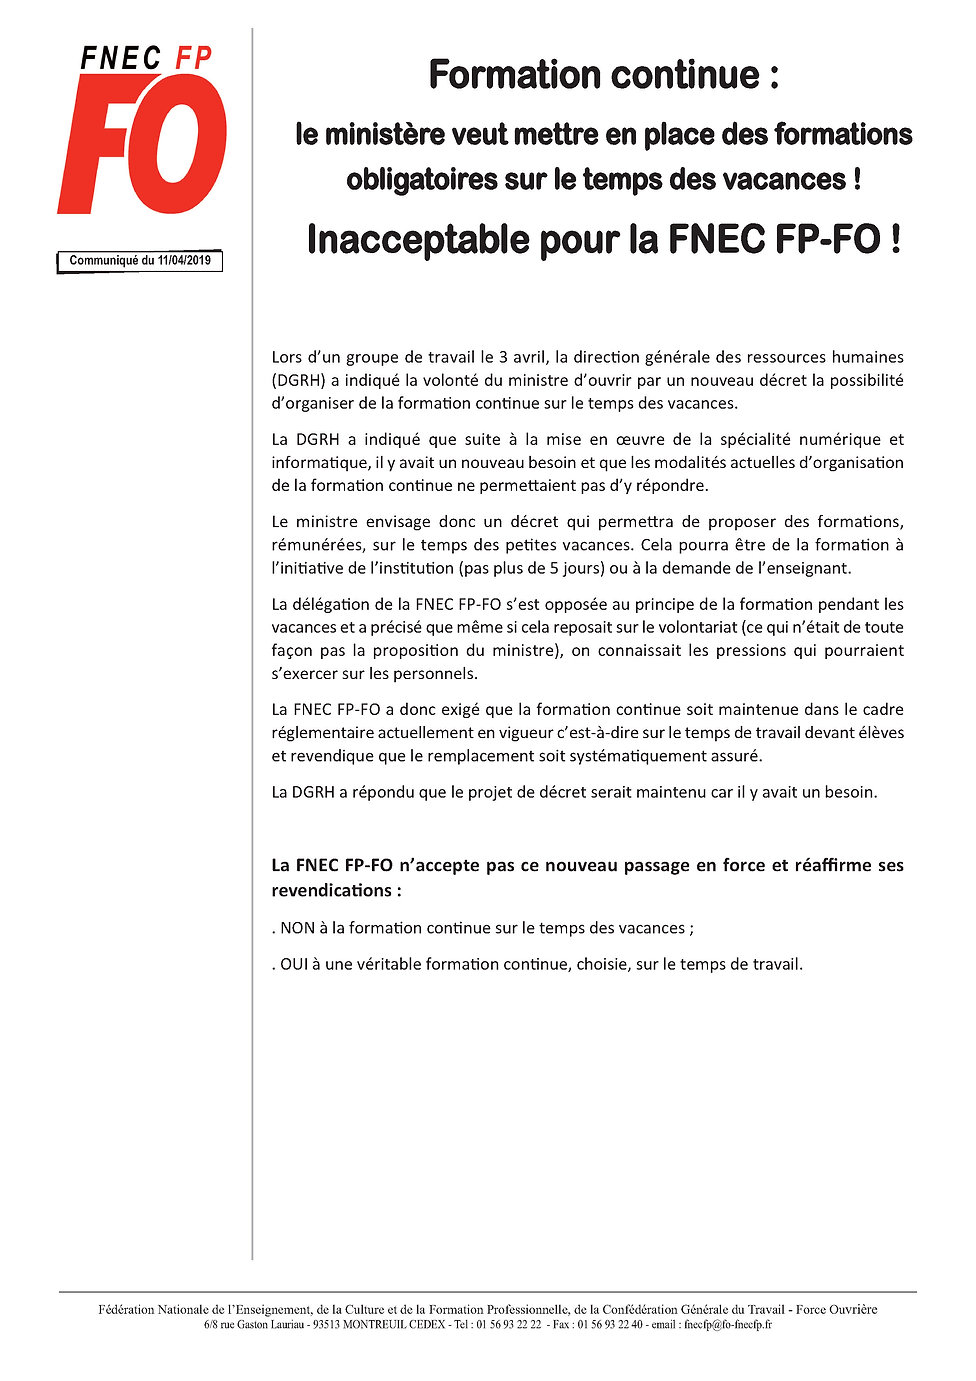 Communiqué_formation_continue.jpg